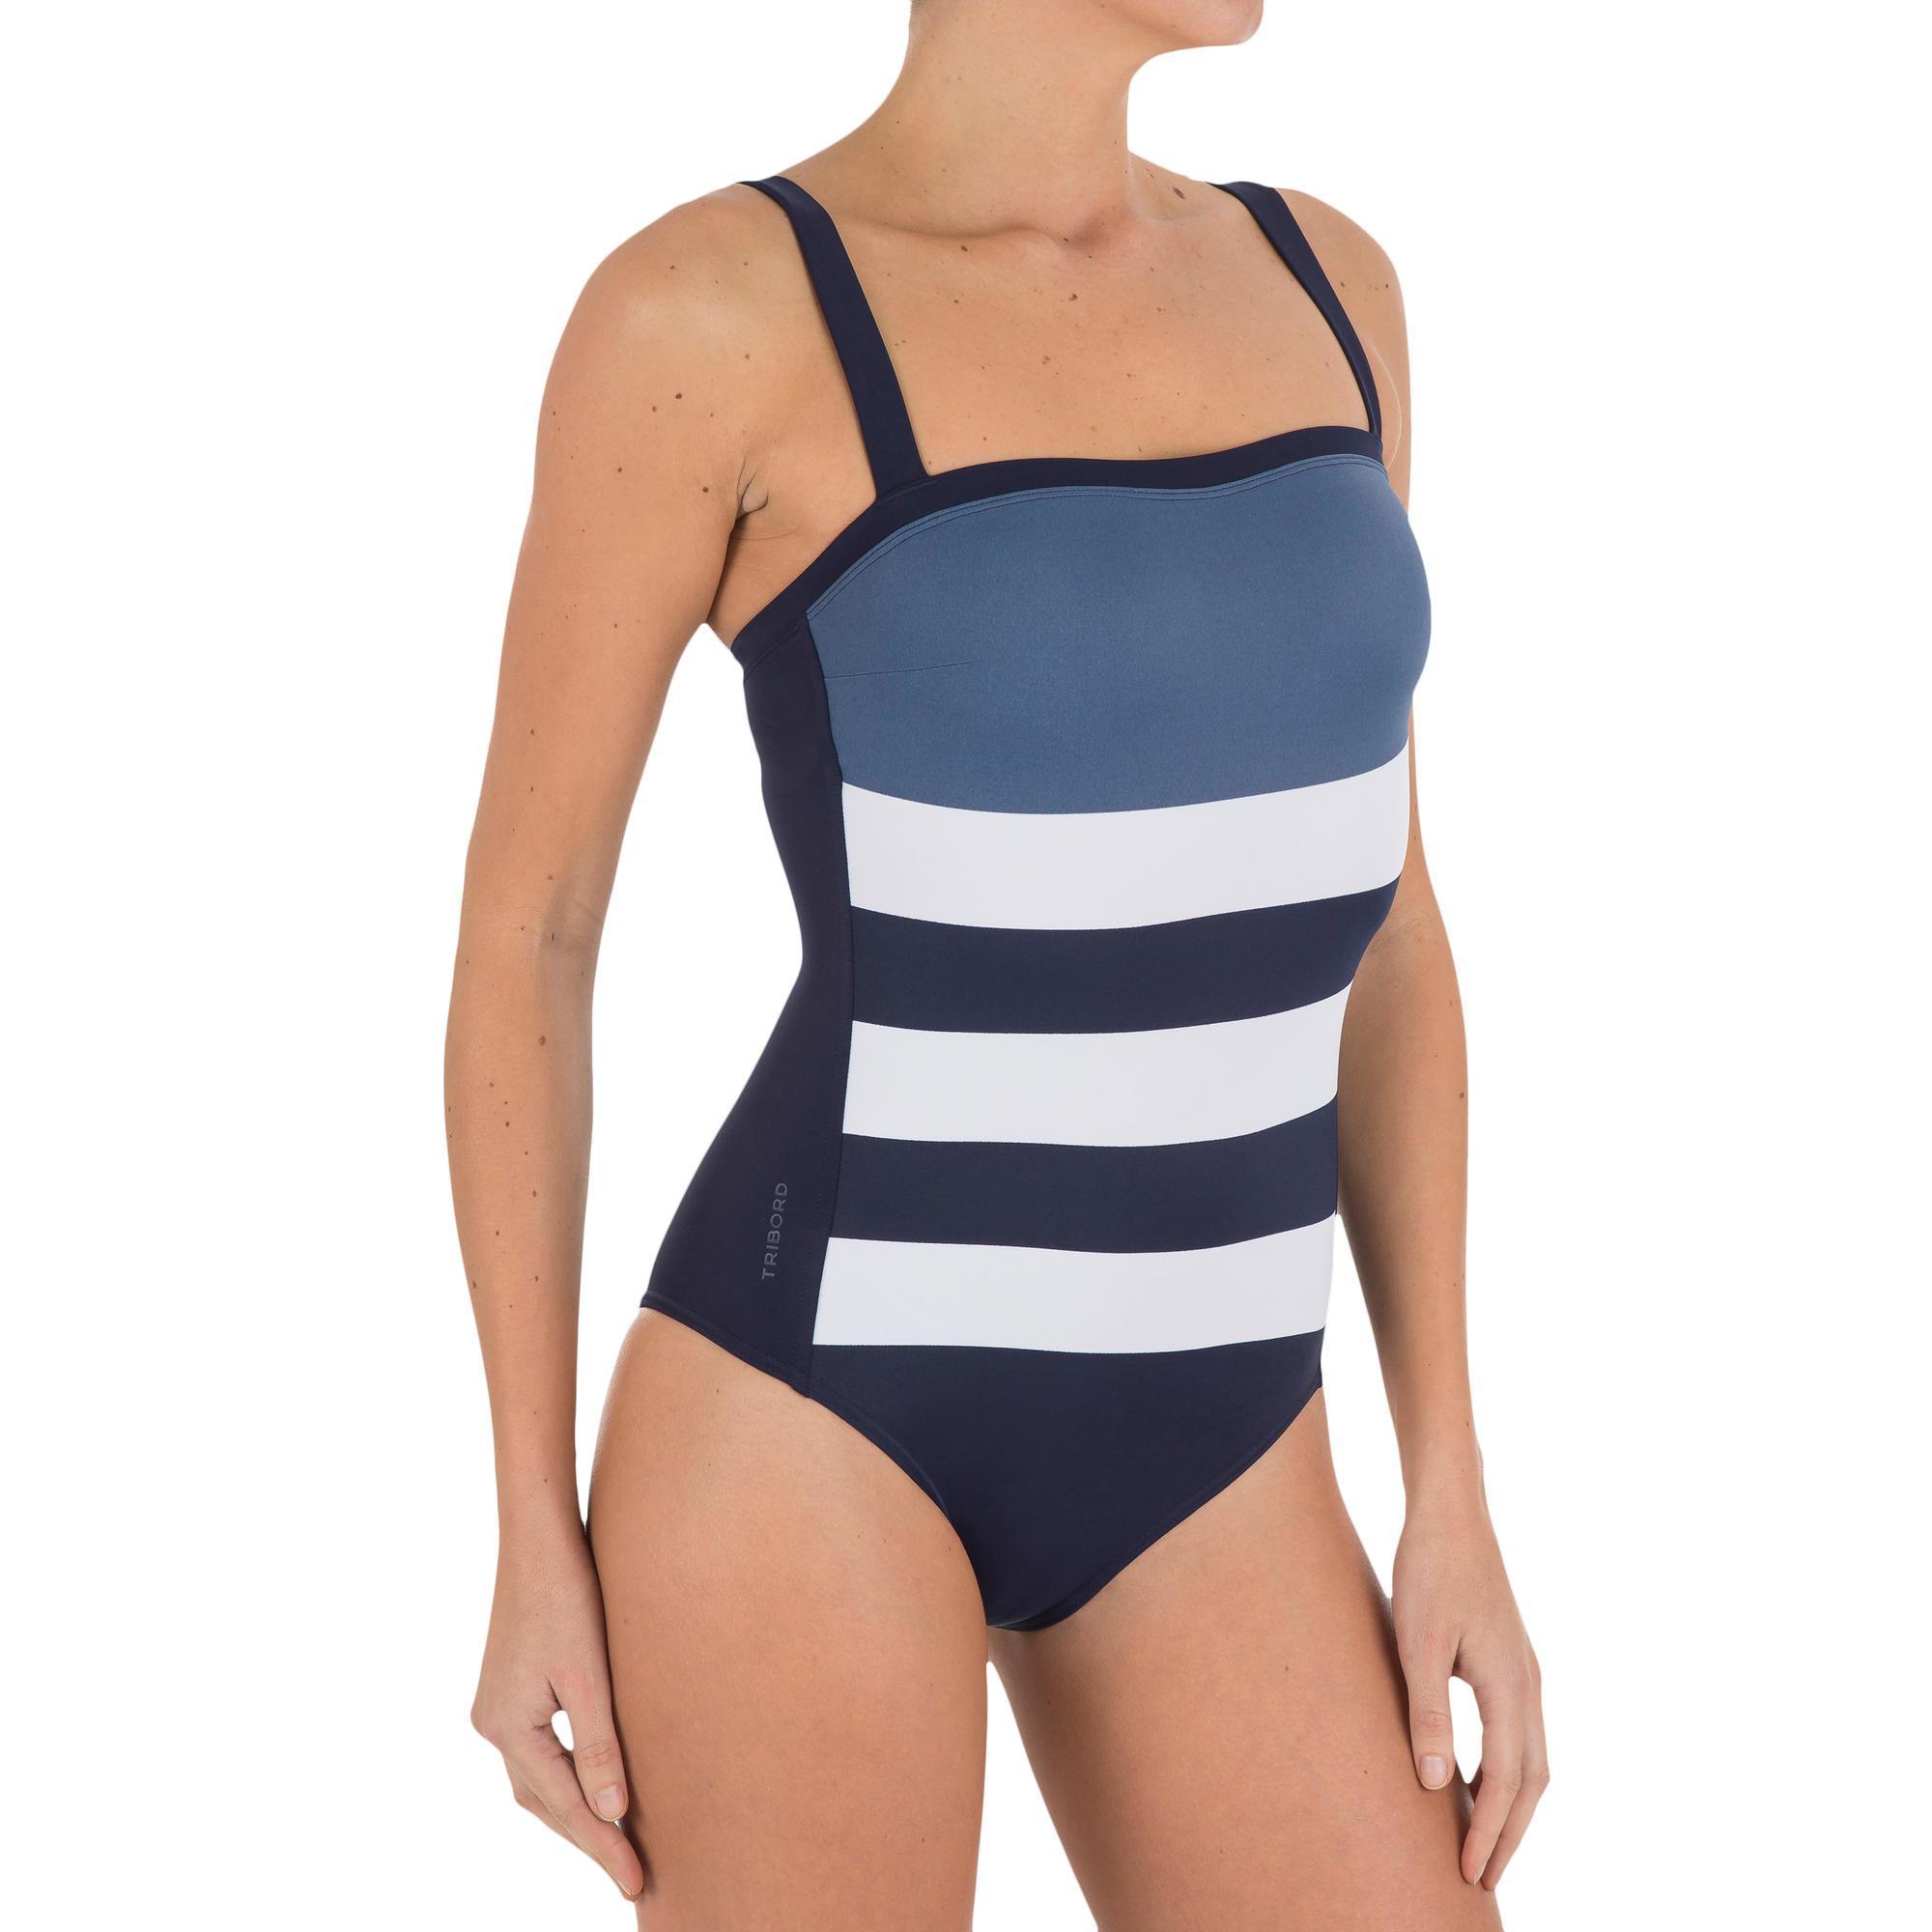 942877c444661 Cori One-Piece Swimsuit with Built-In Bra - Hampto